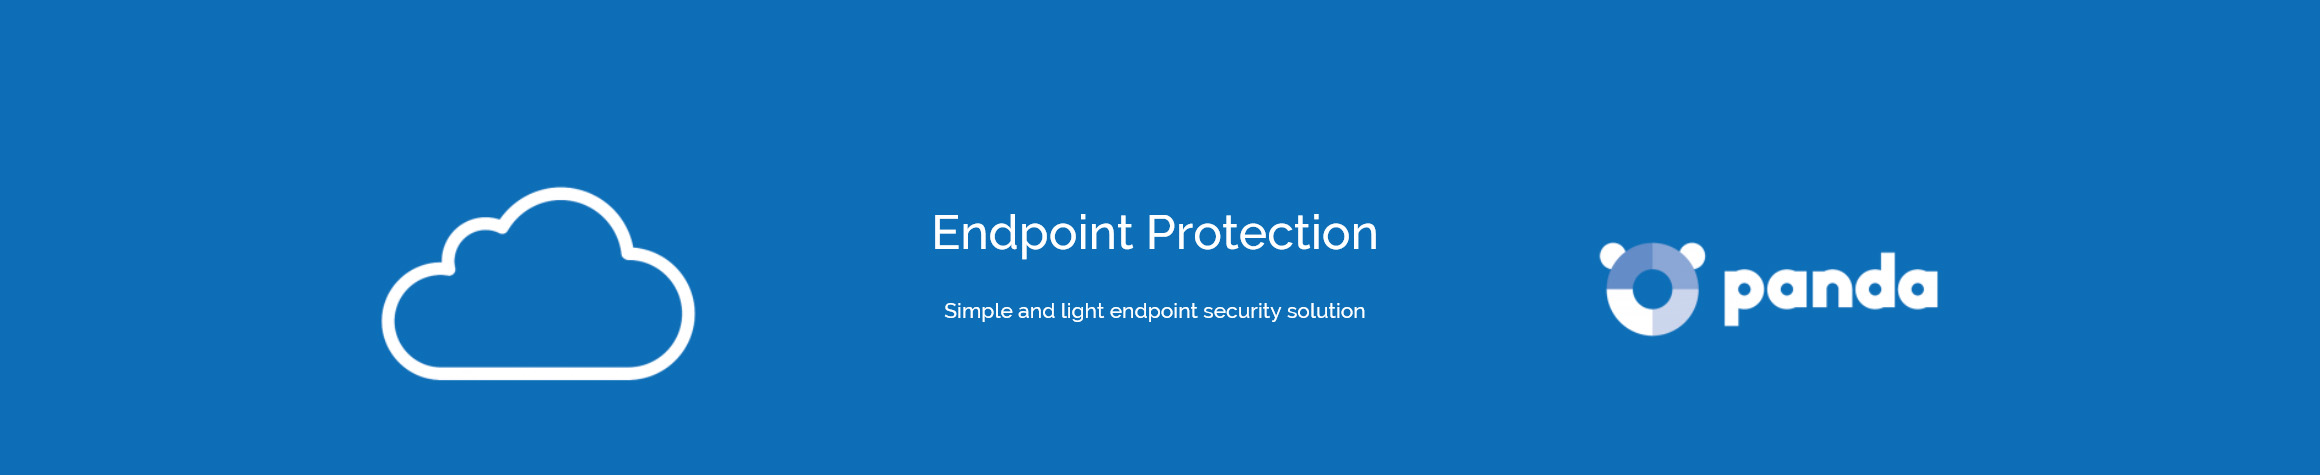 Panda Anti Virus - Endpoint Protection - Twin Technology